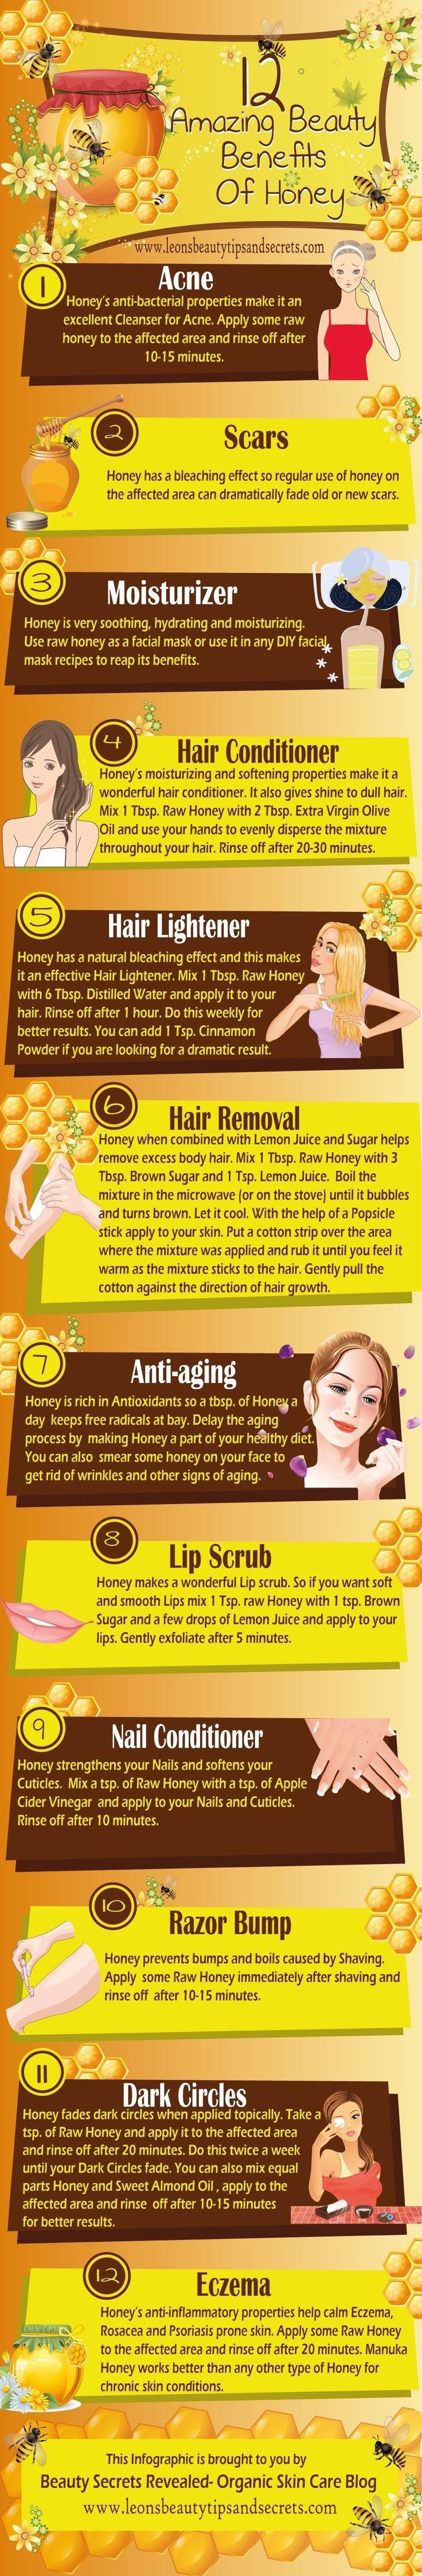 12 Amazing Beauty Benefits Of Honey, How Helpful! :)